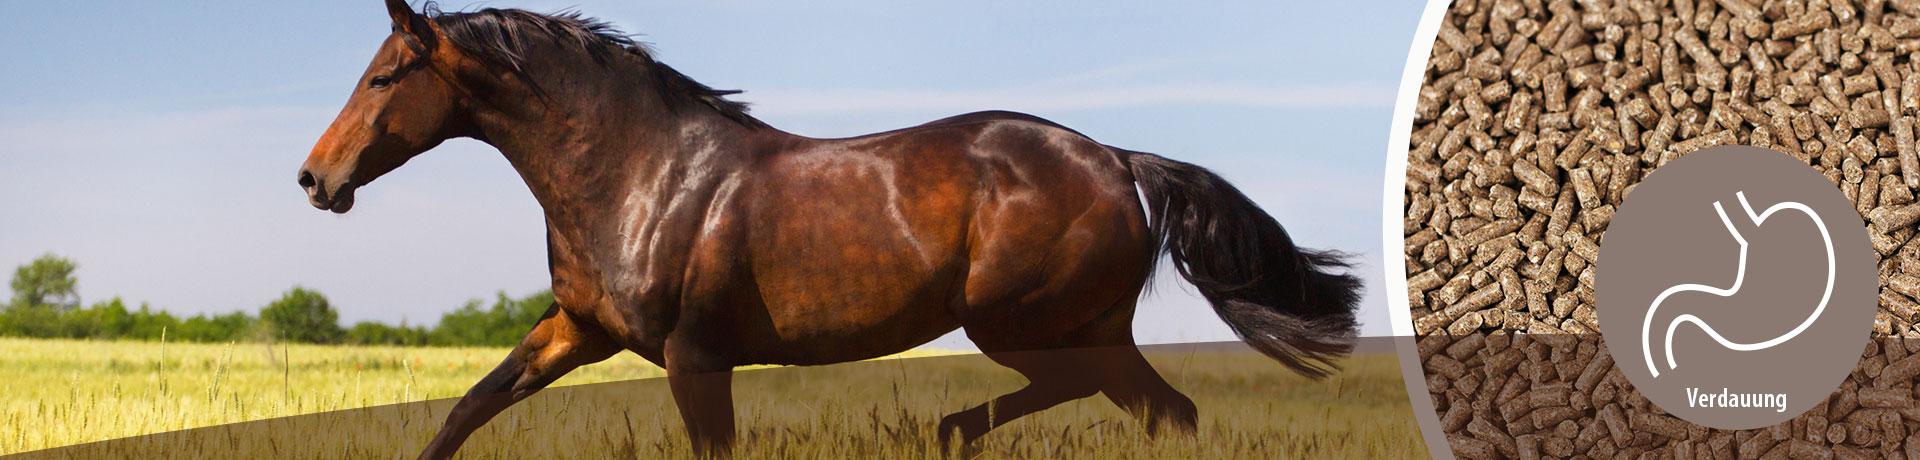 Pferd - Unterkategorie - Verdauung